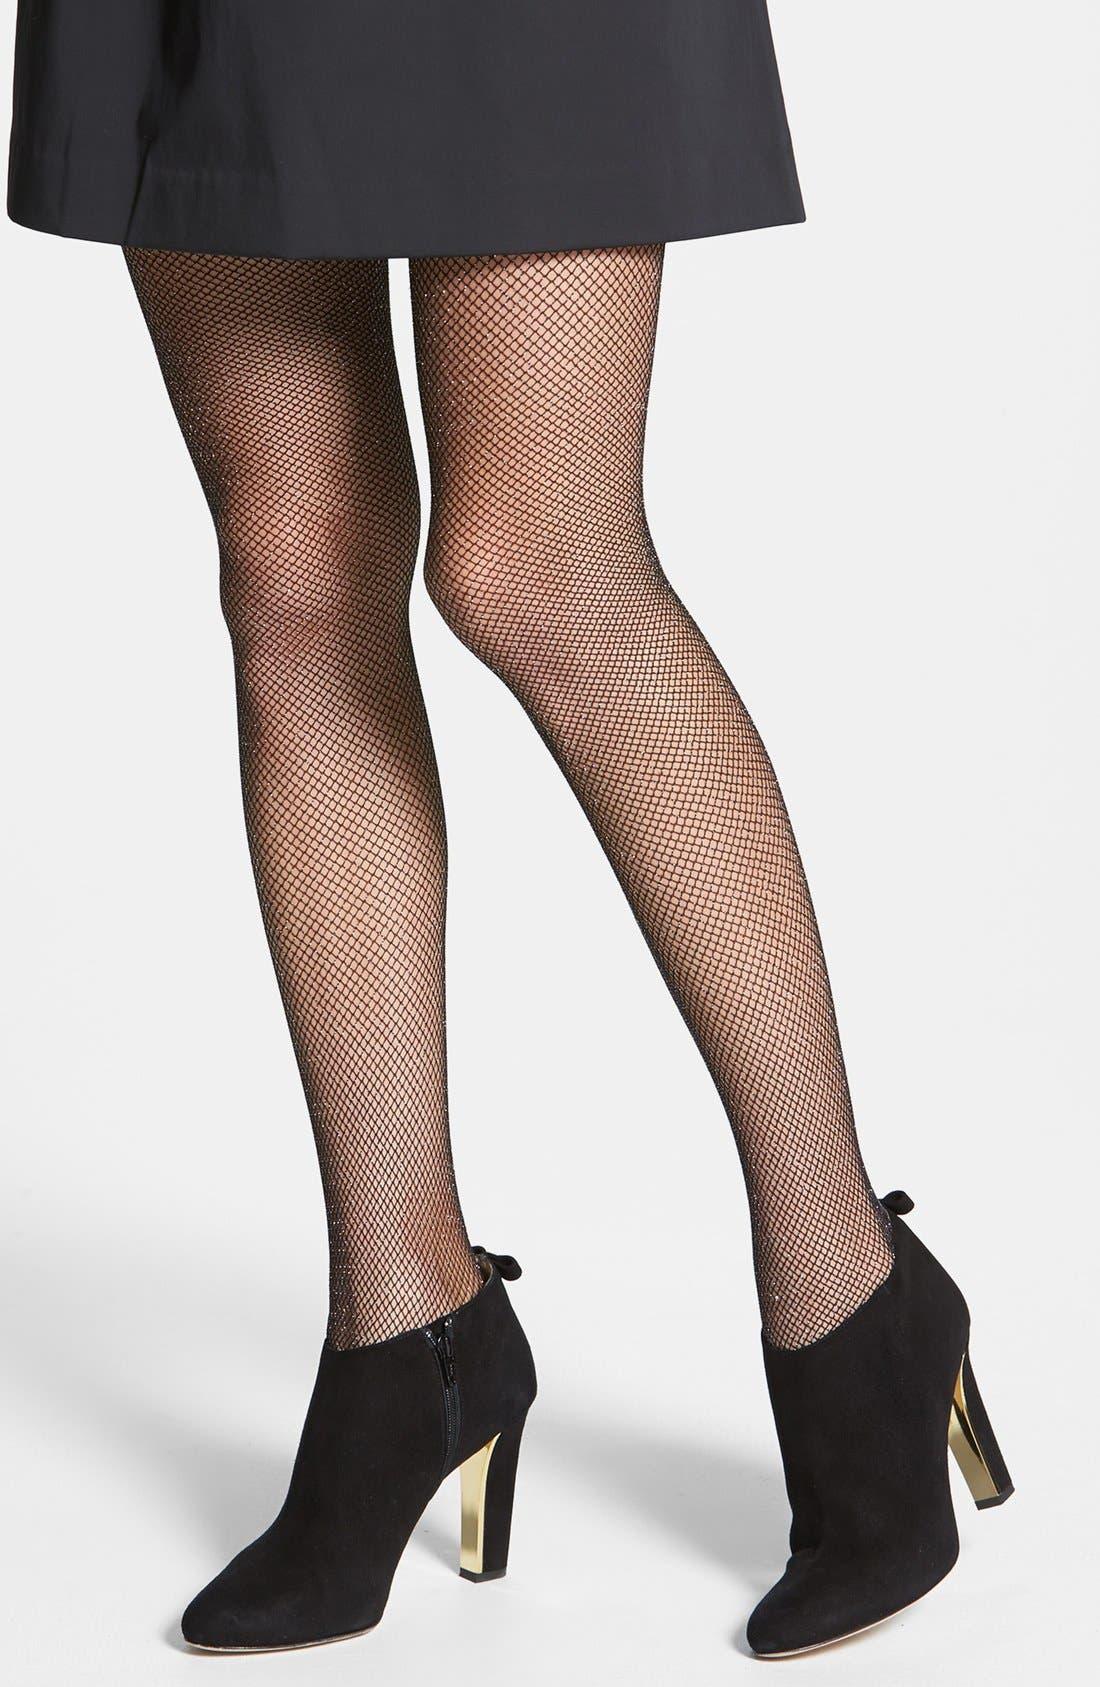 Alternate Image 1 Selected - kate spade new york 'sparkle' fishnet stockings